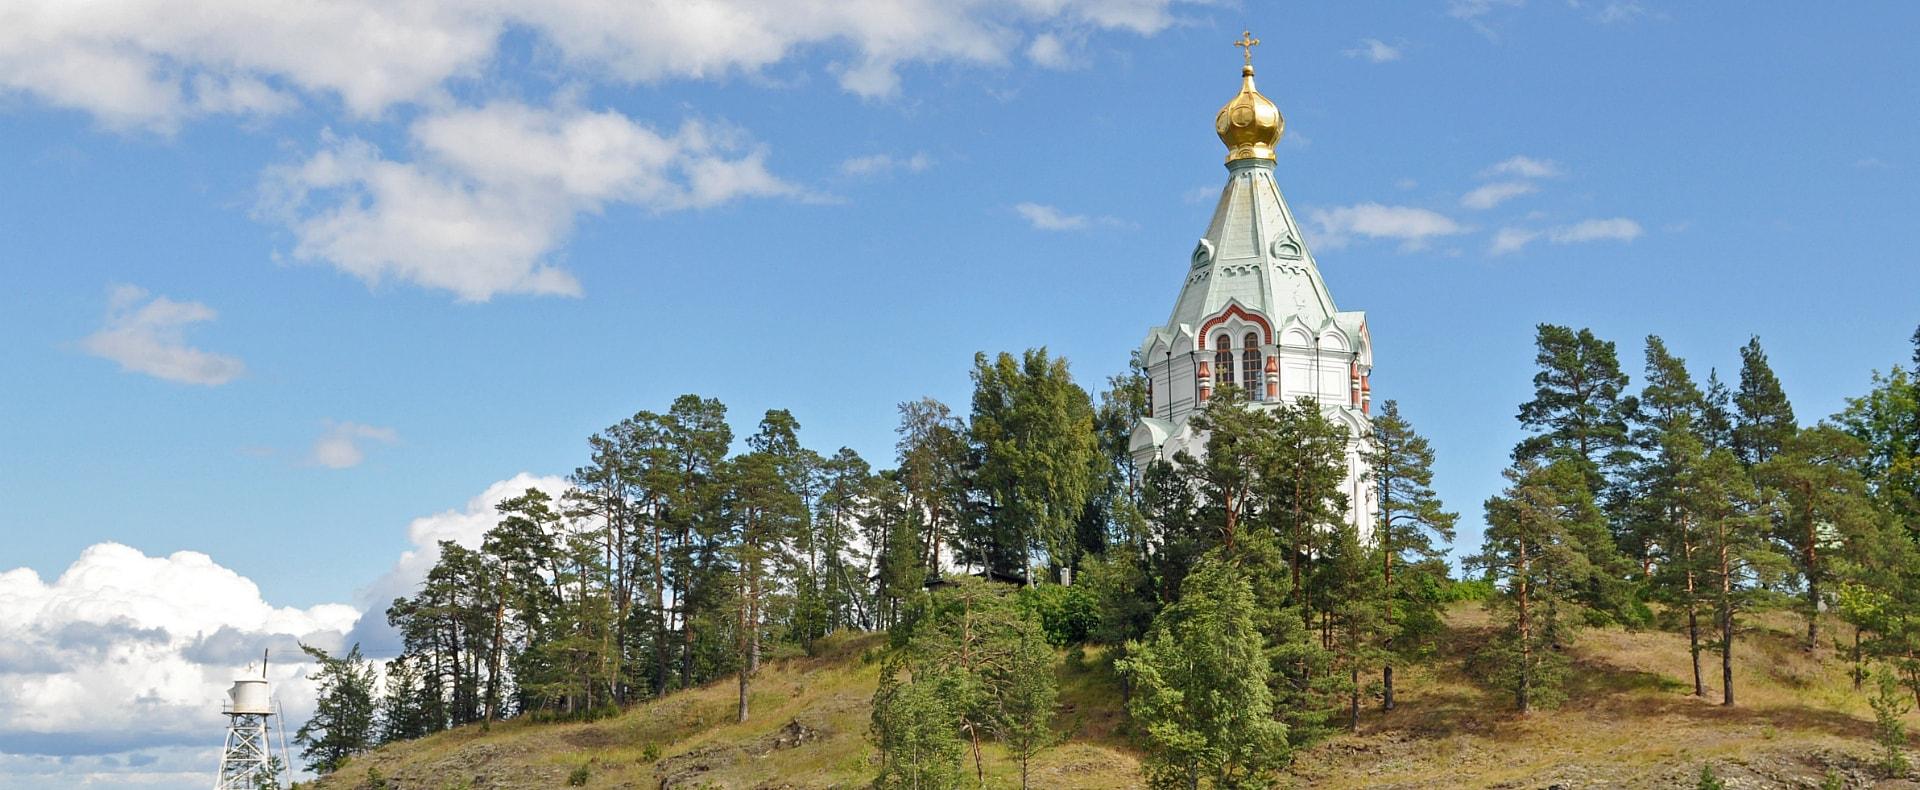 Sortavala, Russia Gallery